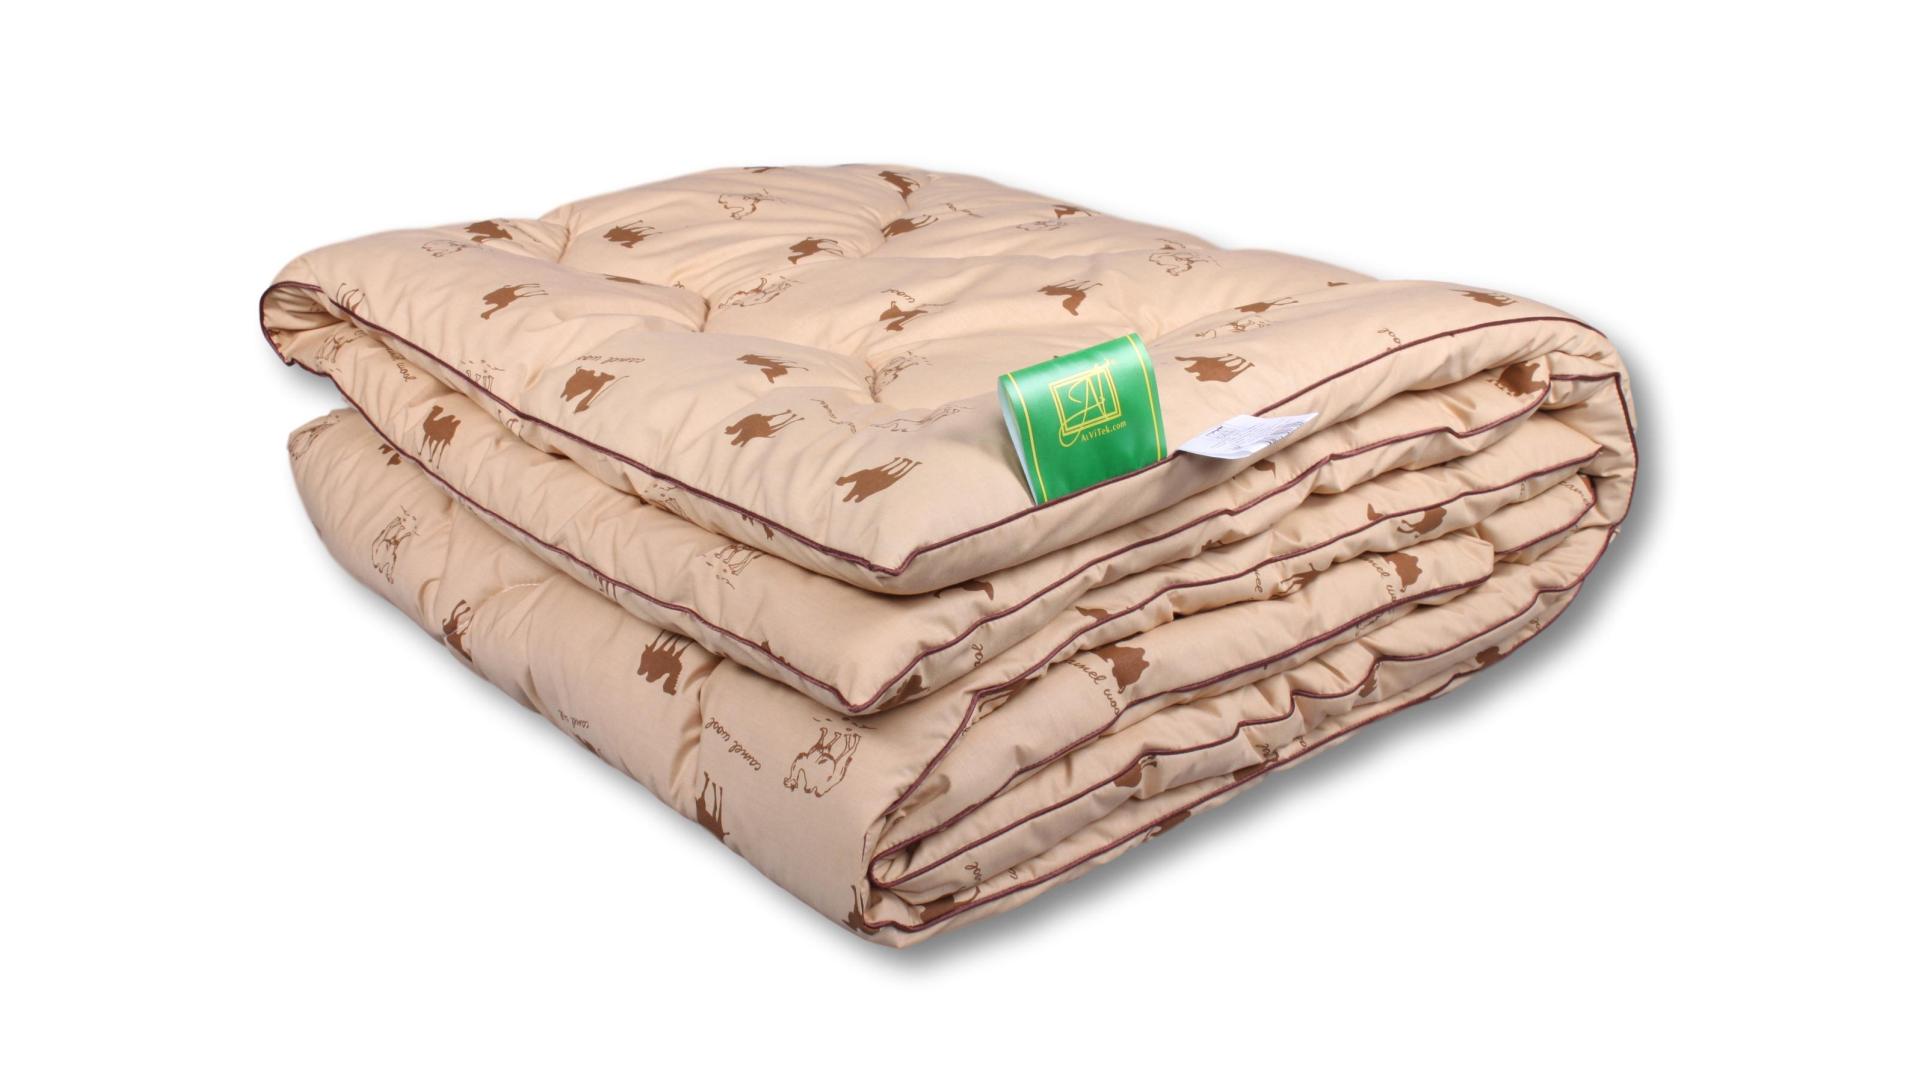 Одеяло САХАРА-Стандарт Классическое-всесезонное фото FullHD (0)